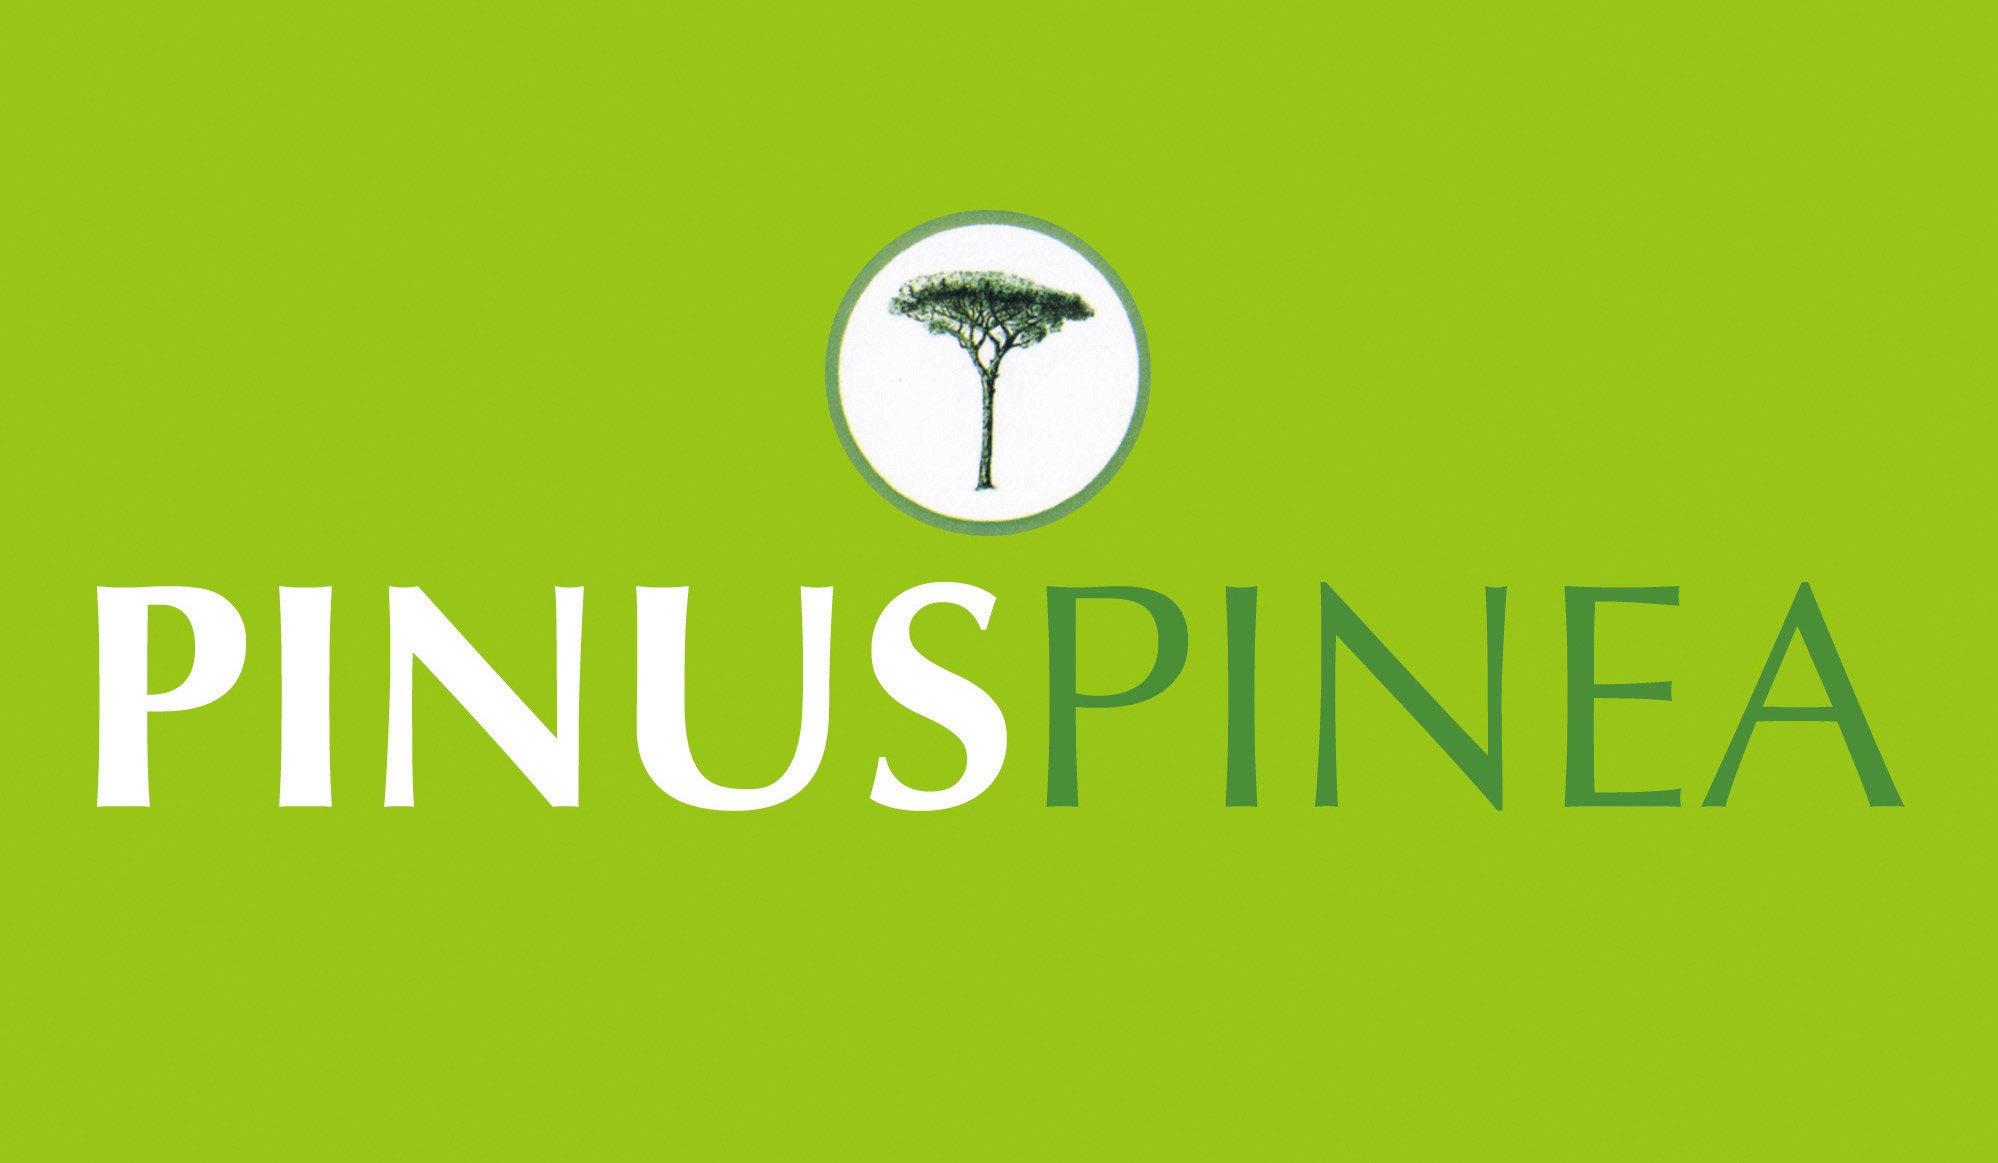 logo-pinus-pinea3